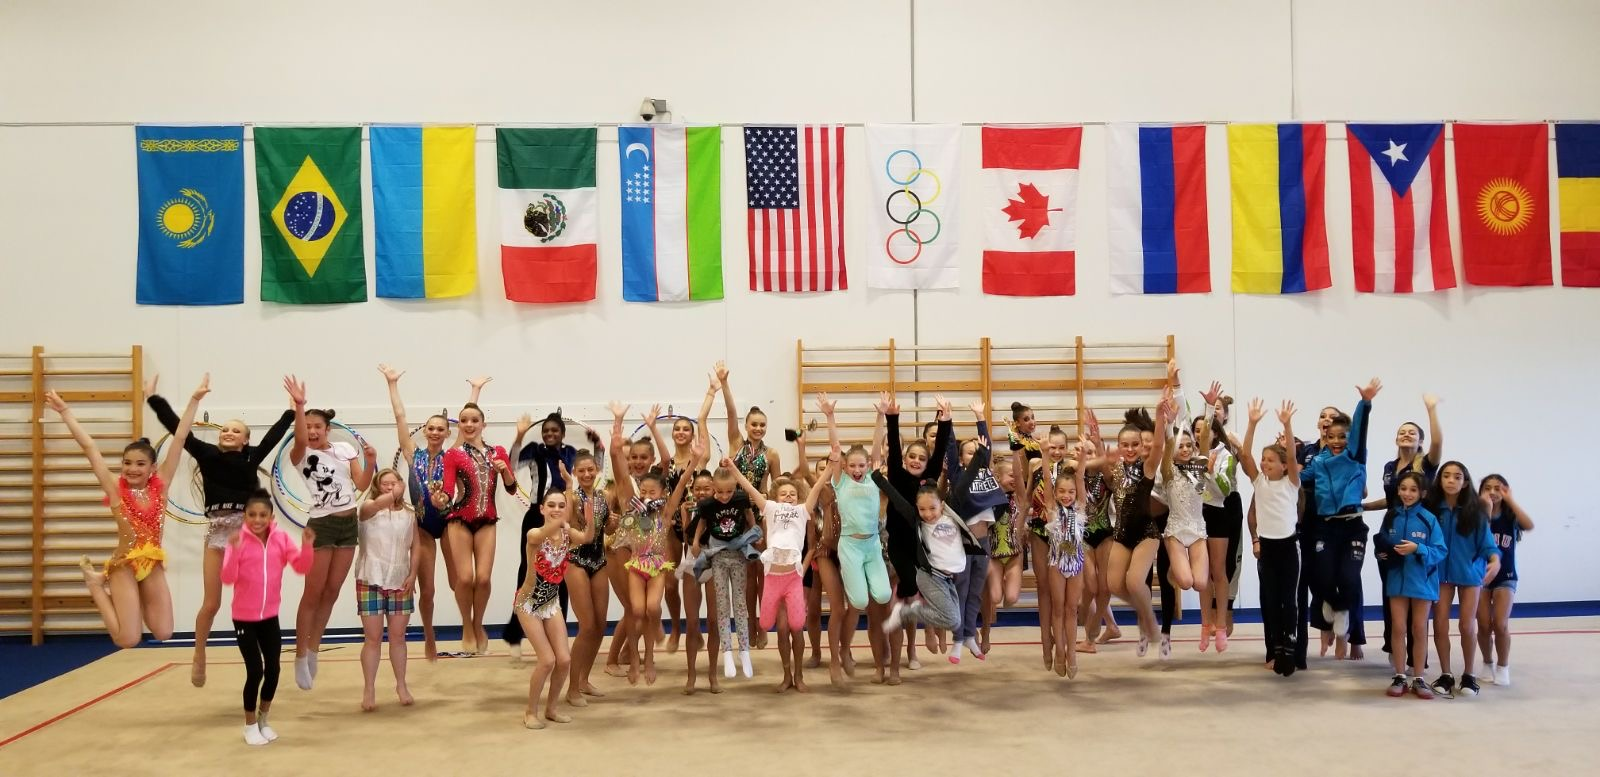 rhythmic gymnastics miami intensive summer camp international training base florida national team professional coaching